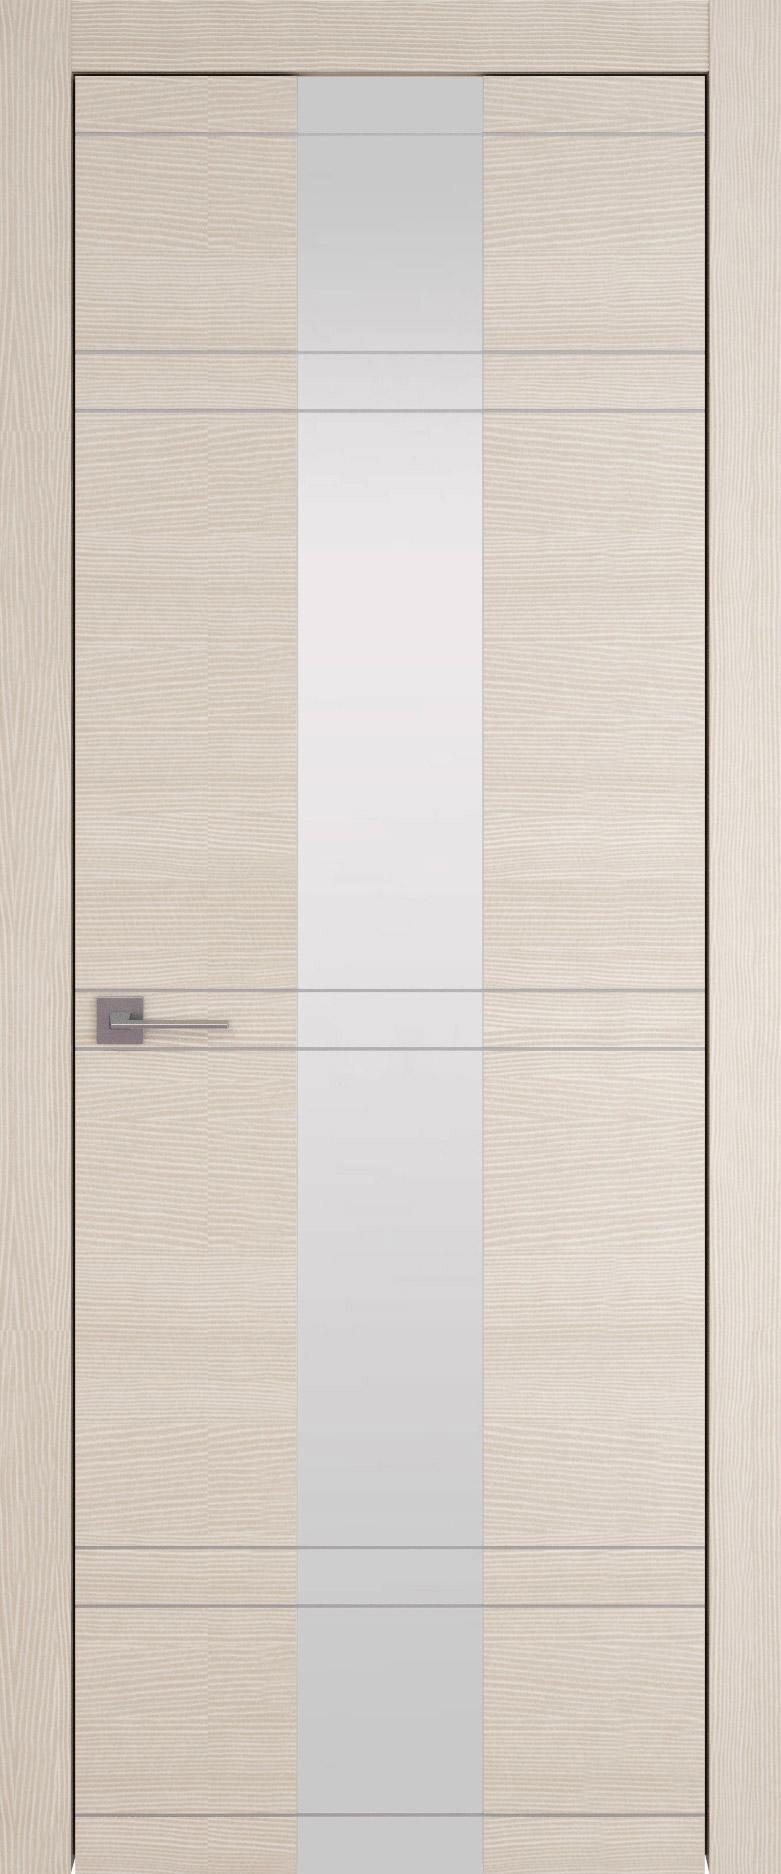 Tivoli Ж-4 цвет - Беленый дуб Со стеклом (ДО)